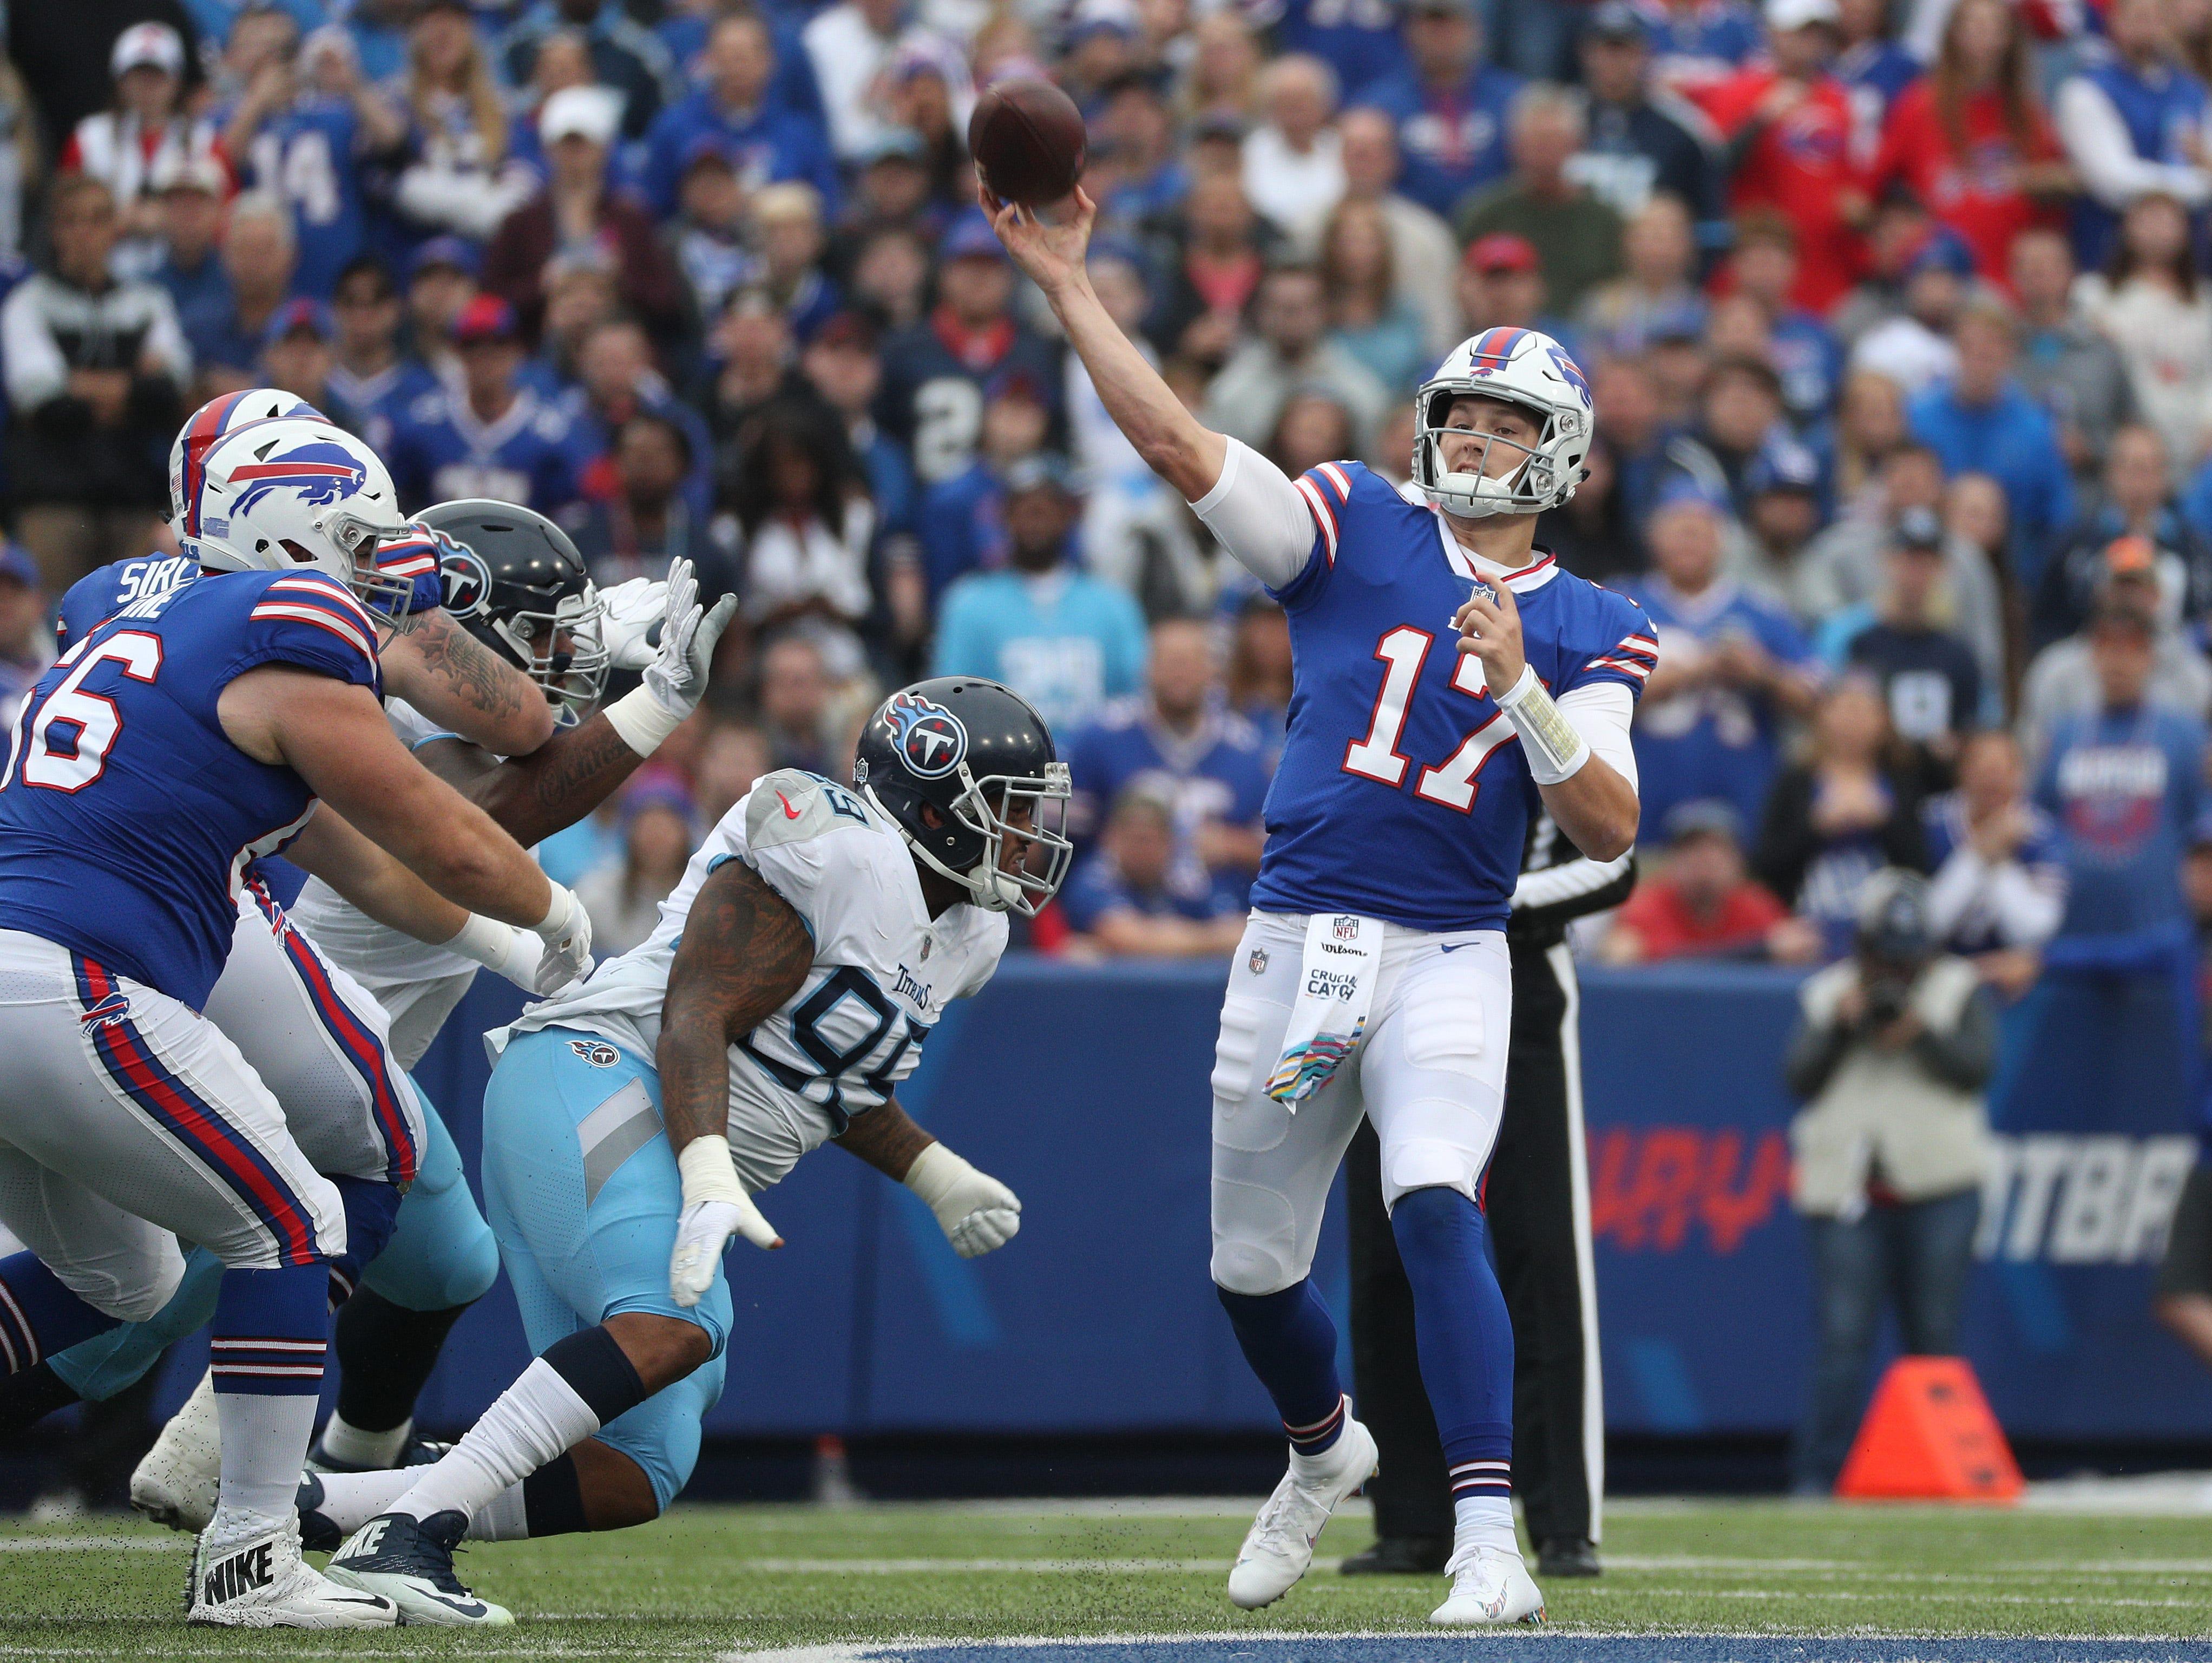 Bills quarterback Josh Allen steps into this deep pass.